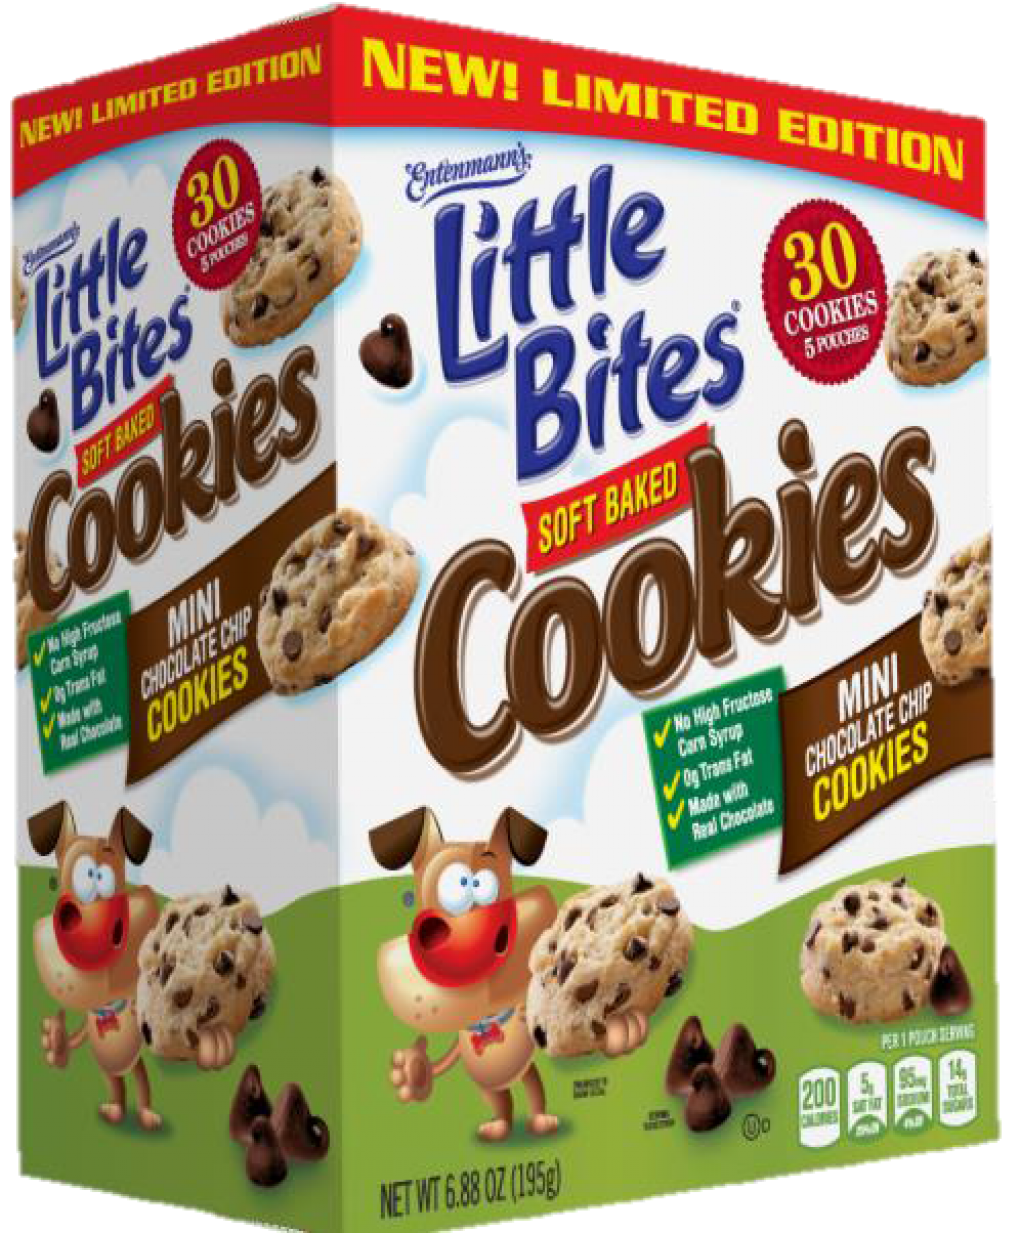 Entenmann's  Little Bites Soft Baked Chocolate Chip Cookies